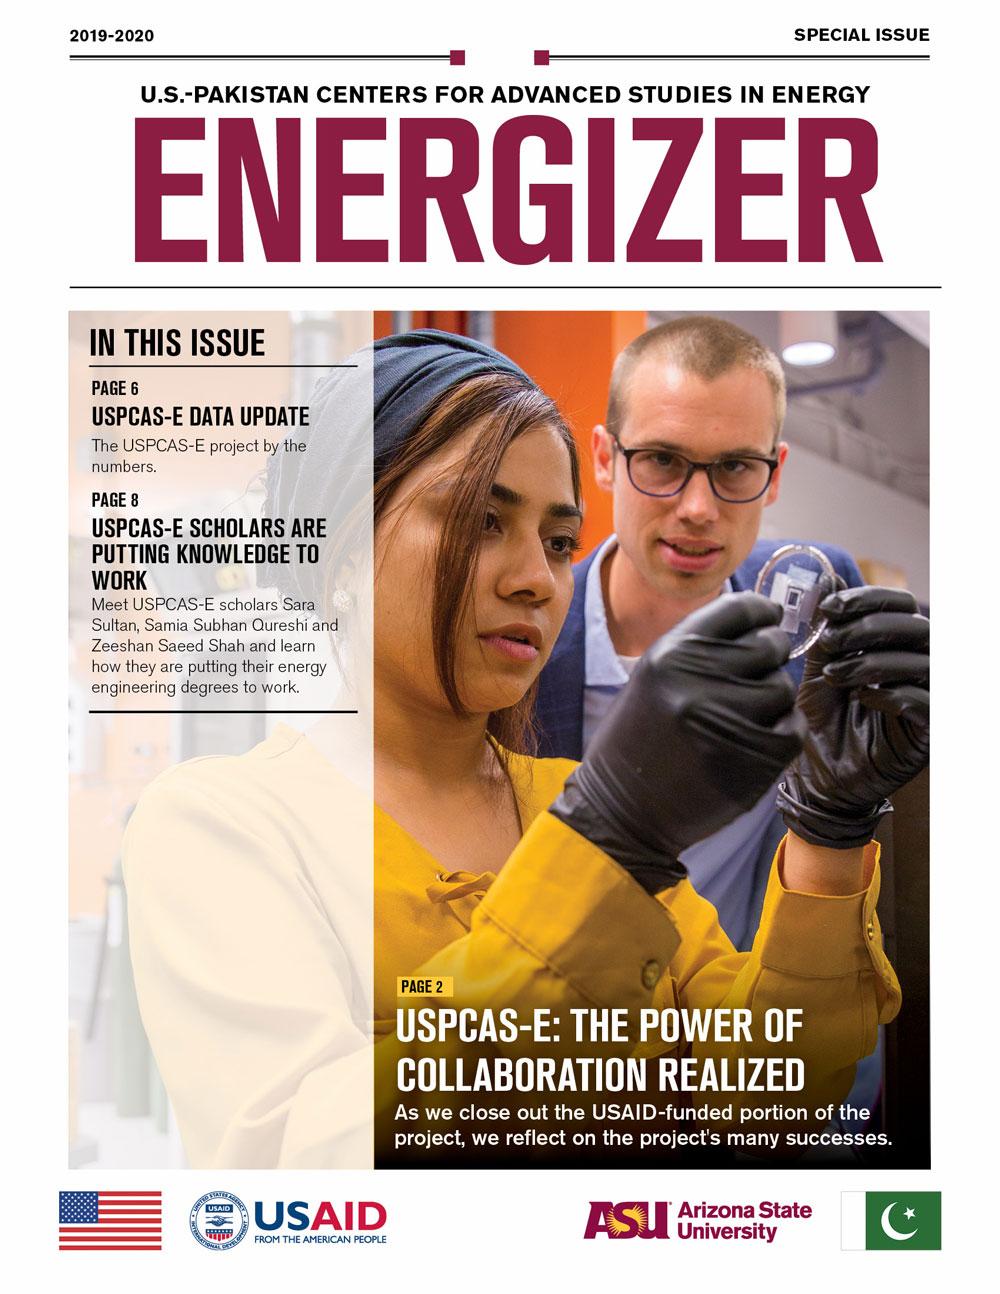 2017-2018 Energizer Newsletter, Issue 2